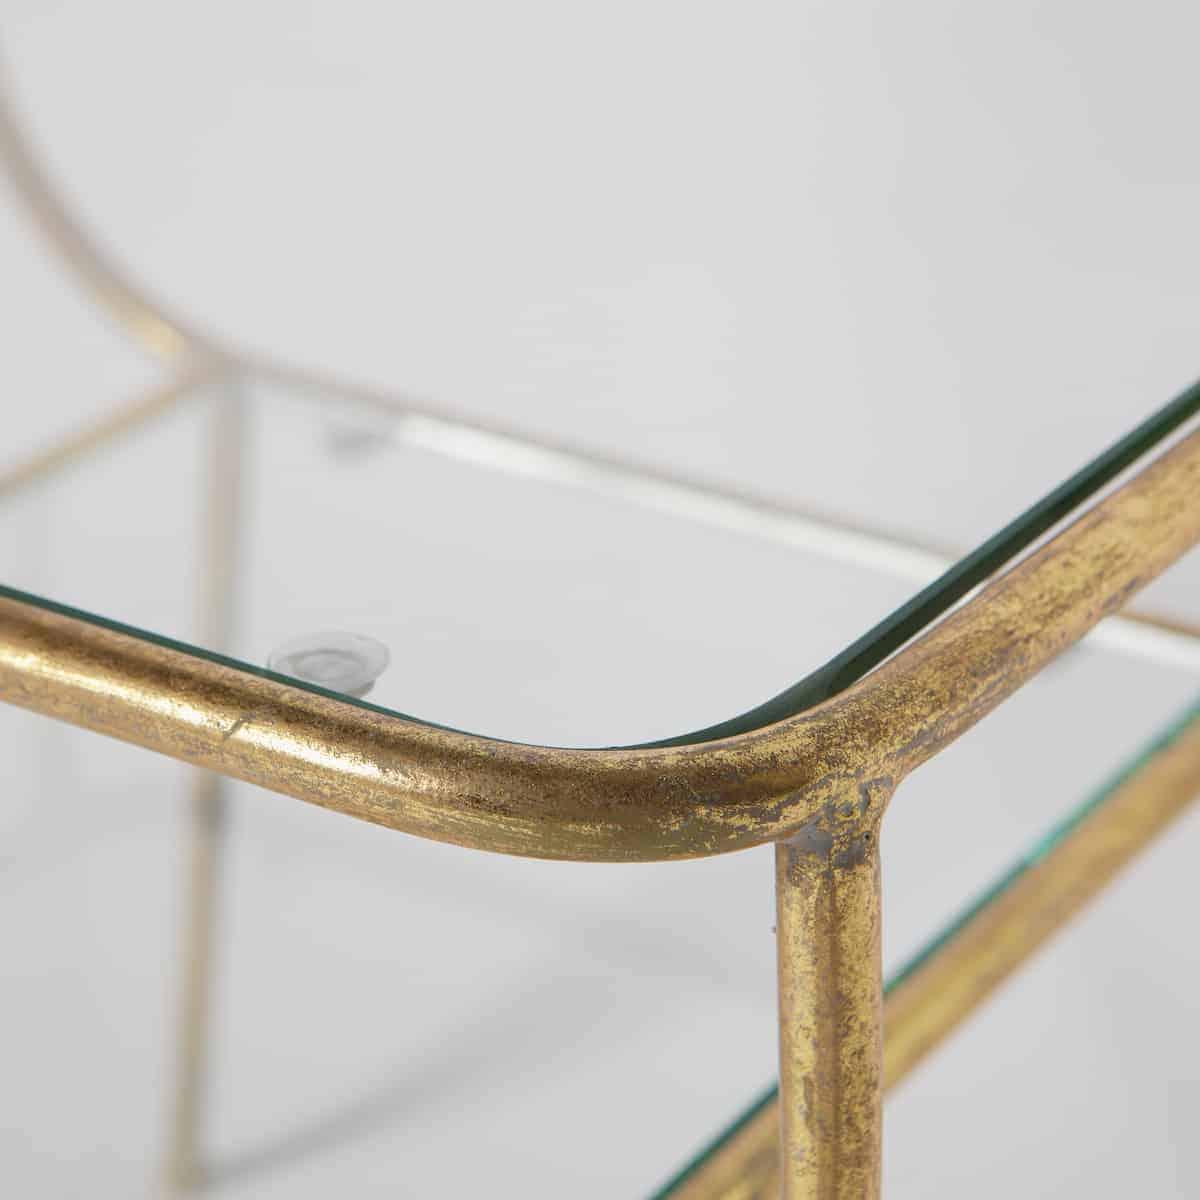 Bijzettafel Metaal Glas.Antique Bijzettafel Bepurehome Amazing Metaal Glas Antique Brass